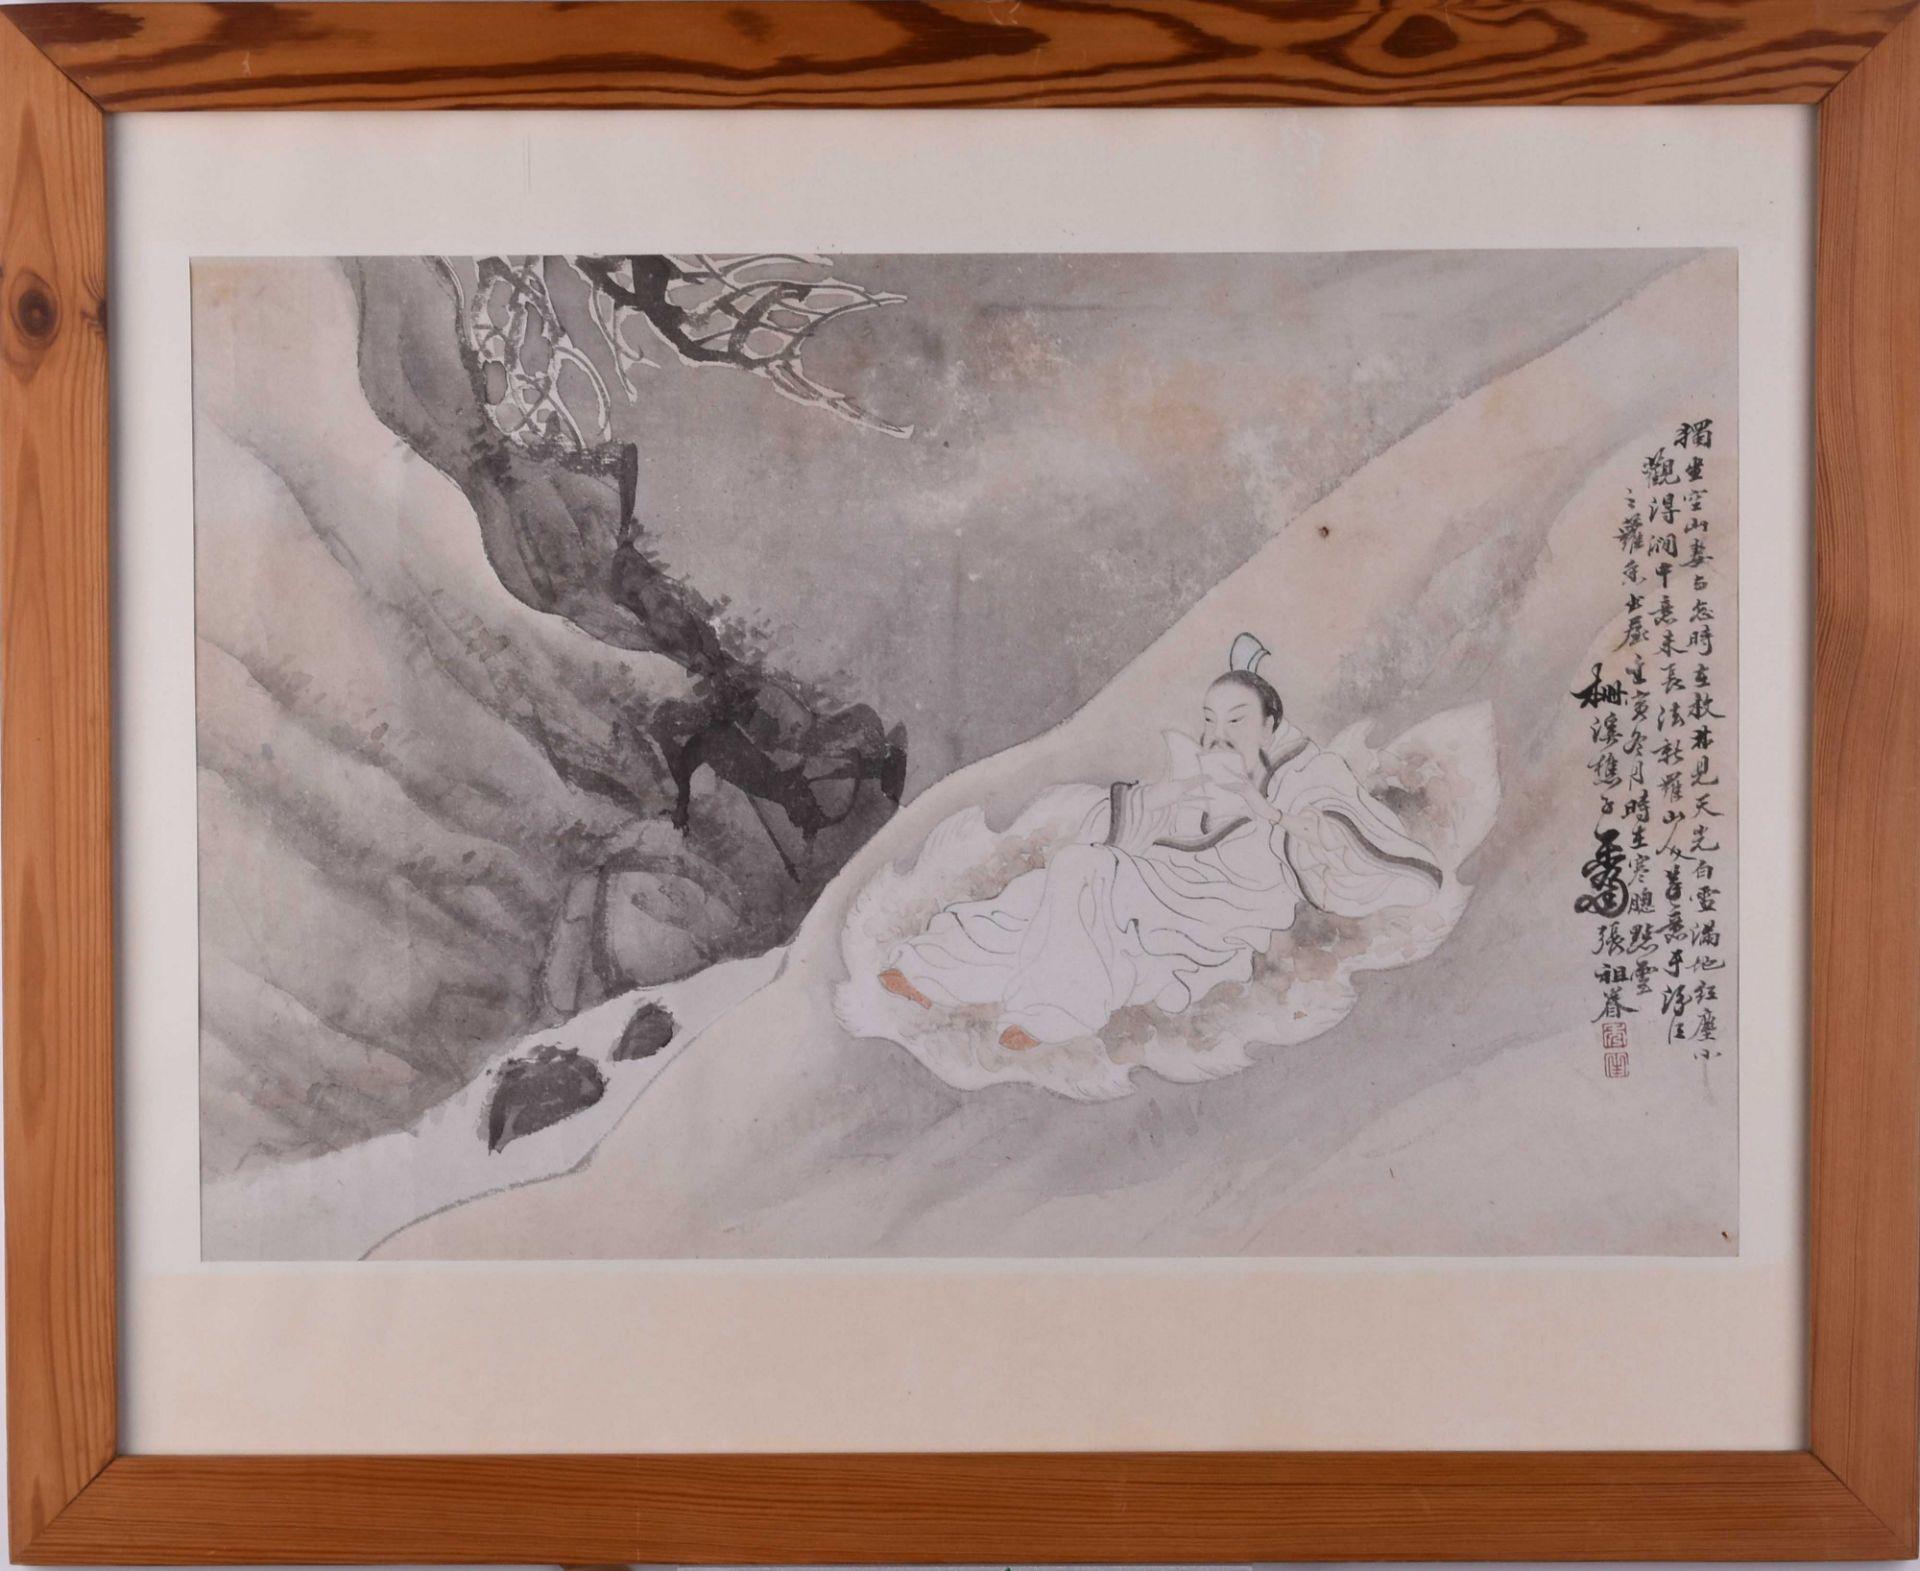 Zhang Zujiän Chinese artist of the 19th century - Image 2 of 6